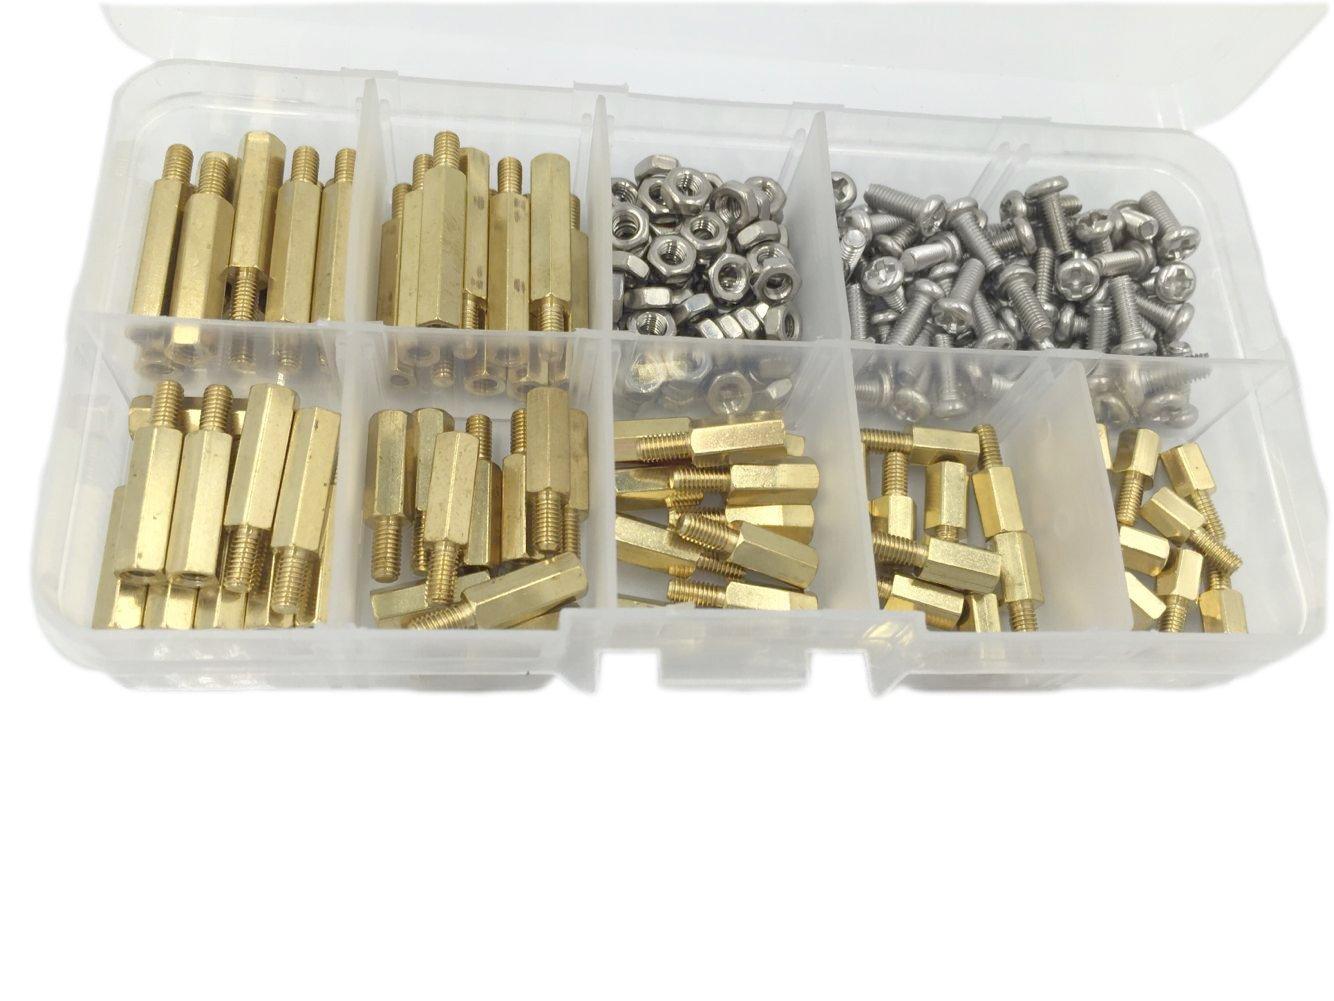 HVAZI 210pcs M3 Male Female Brass Spacer Standoff/Stainless Steel Screw/Nut Assortment Kit